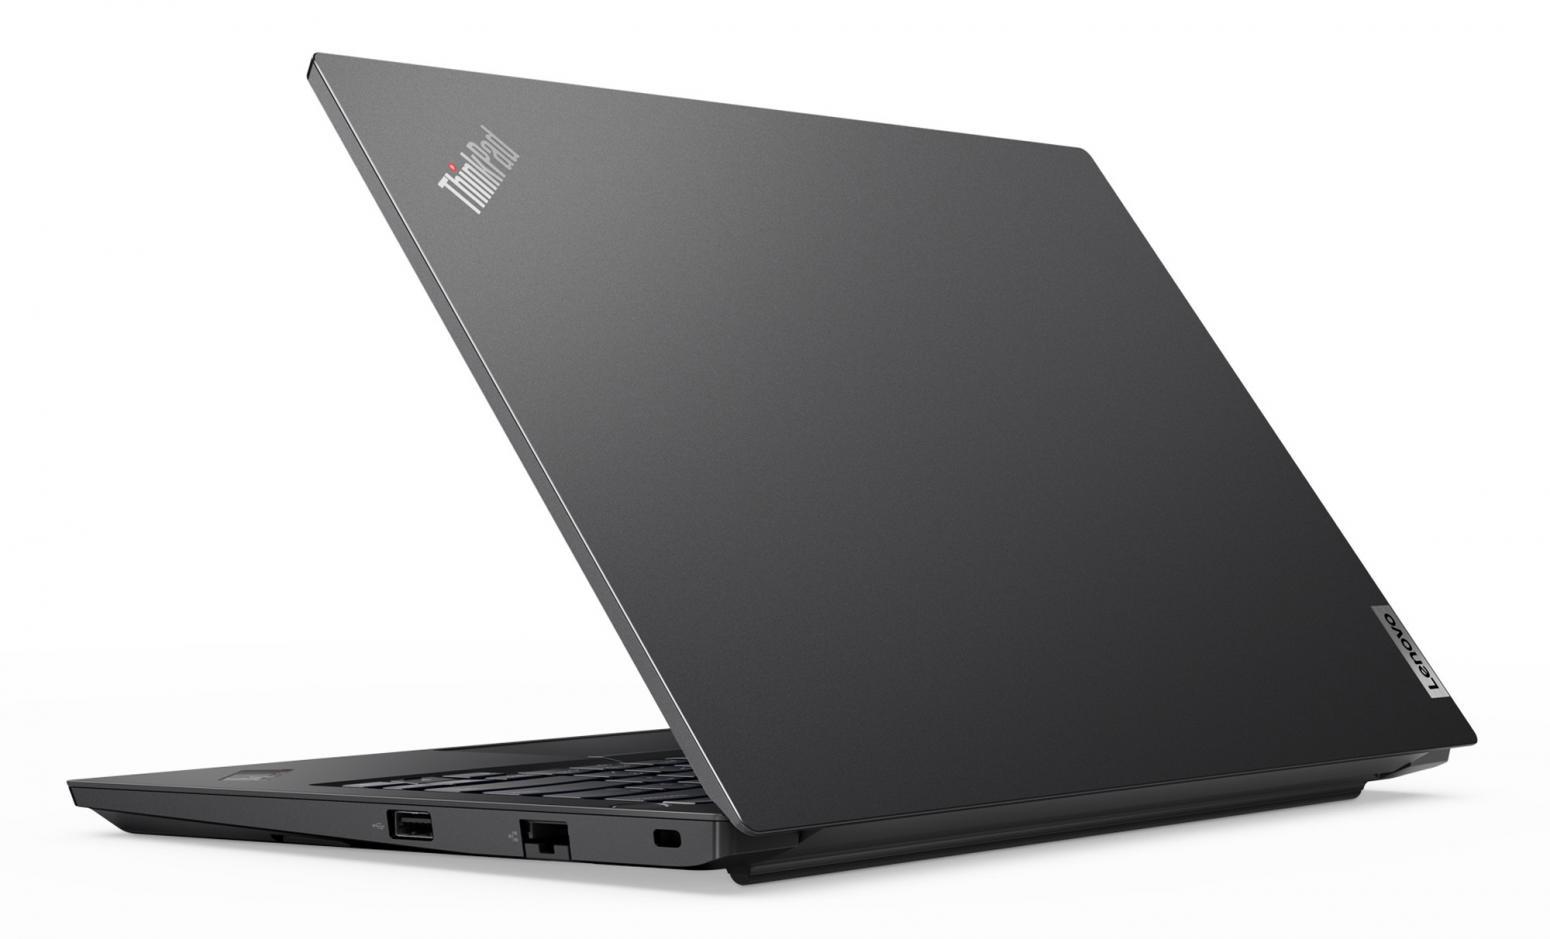 Ordinateur portable Lenovo ThinkPad E14 AMD Gen 3 (20Y7003RFR) Argent - Ryzen 5, Pro - photo 4